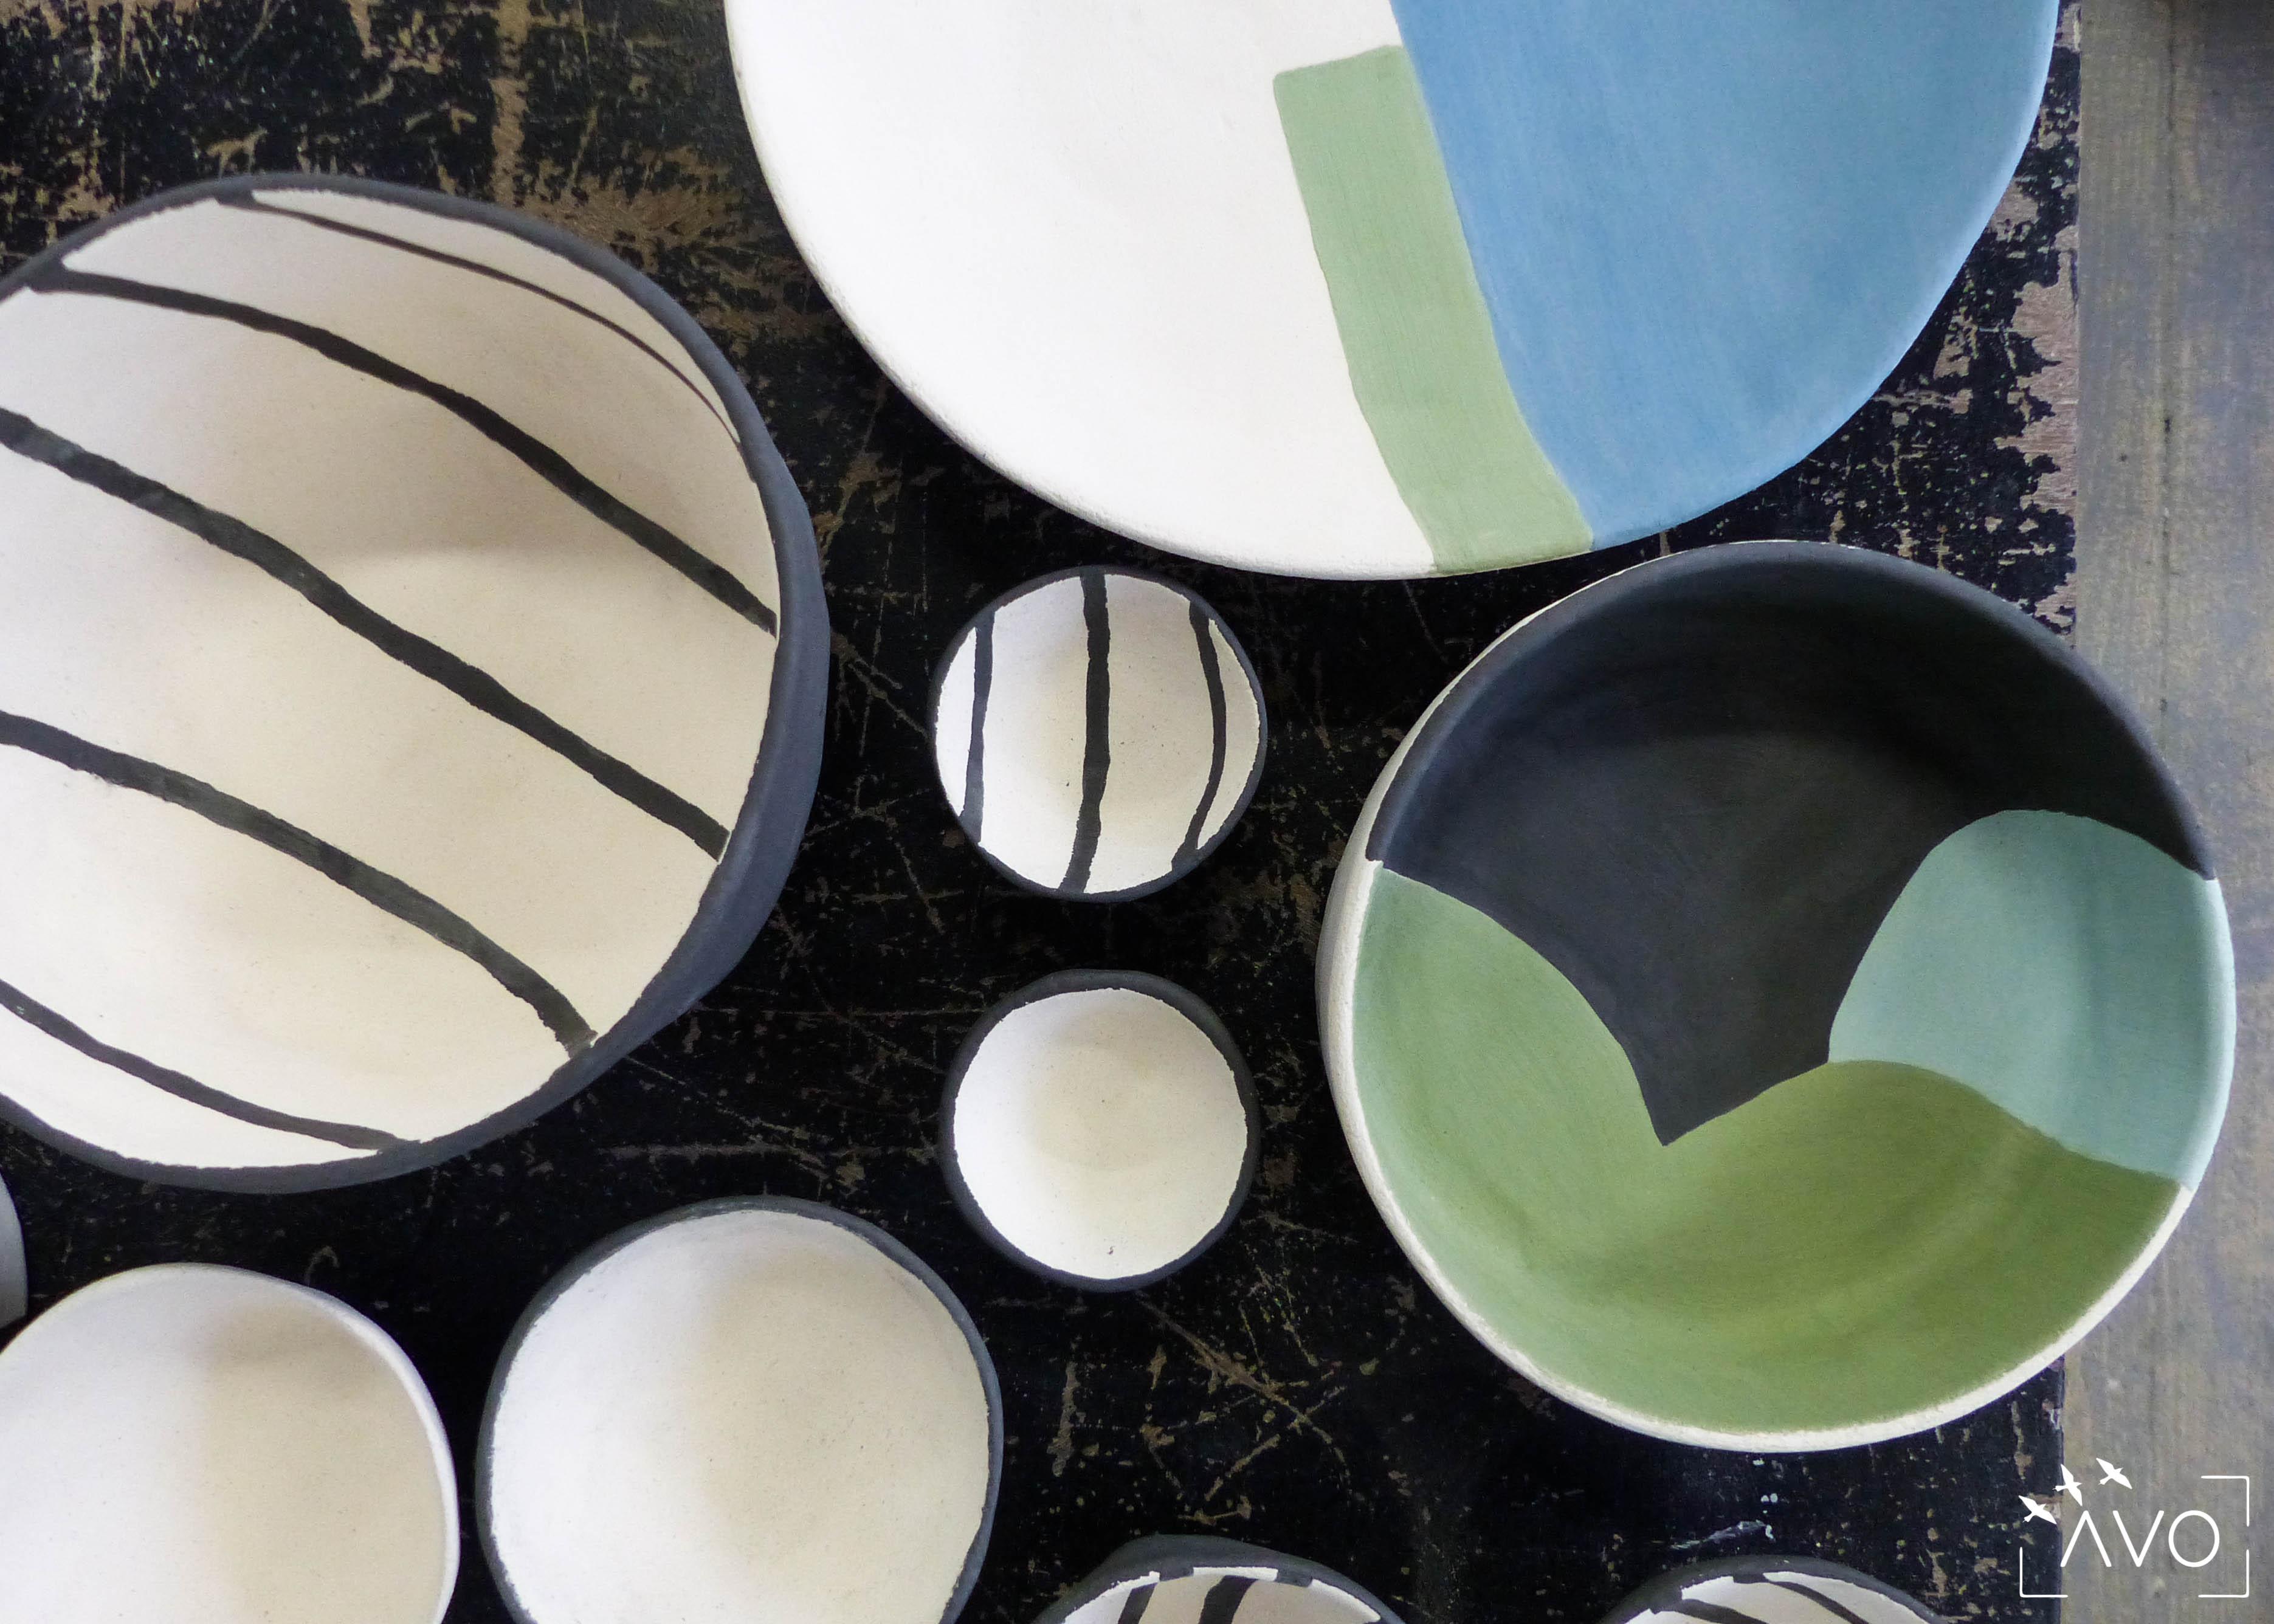 savoir-faire-ceramique-faience-decoration-bol-plat-creatrice-colore-email-terre-local-sabine-orlandini-atelier-rayures-vert